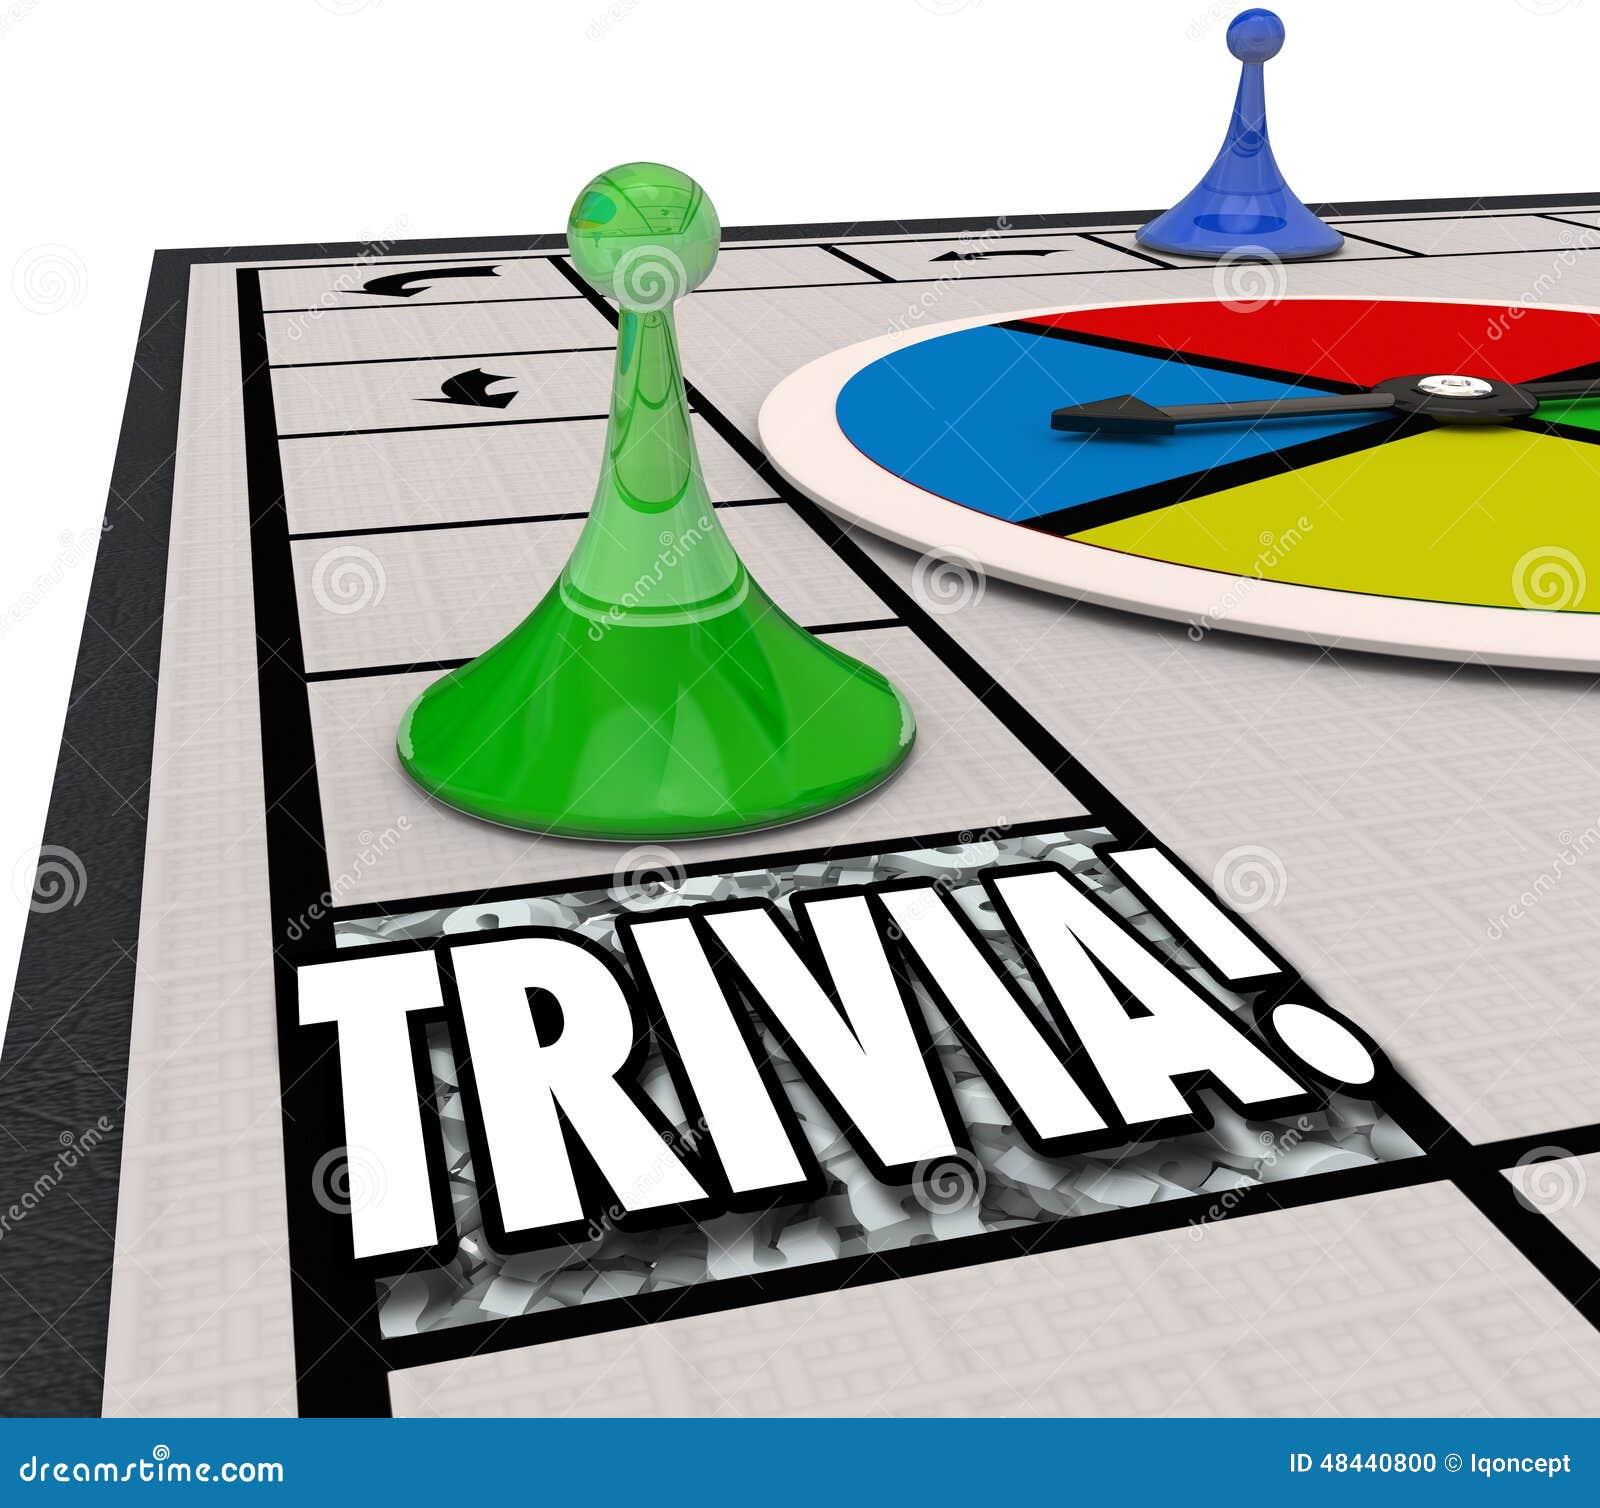 Trivia Board Game Fun Knowledge Challenge Playing Quiz ... - photo#10